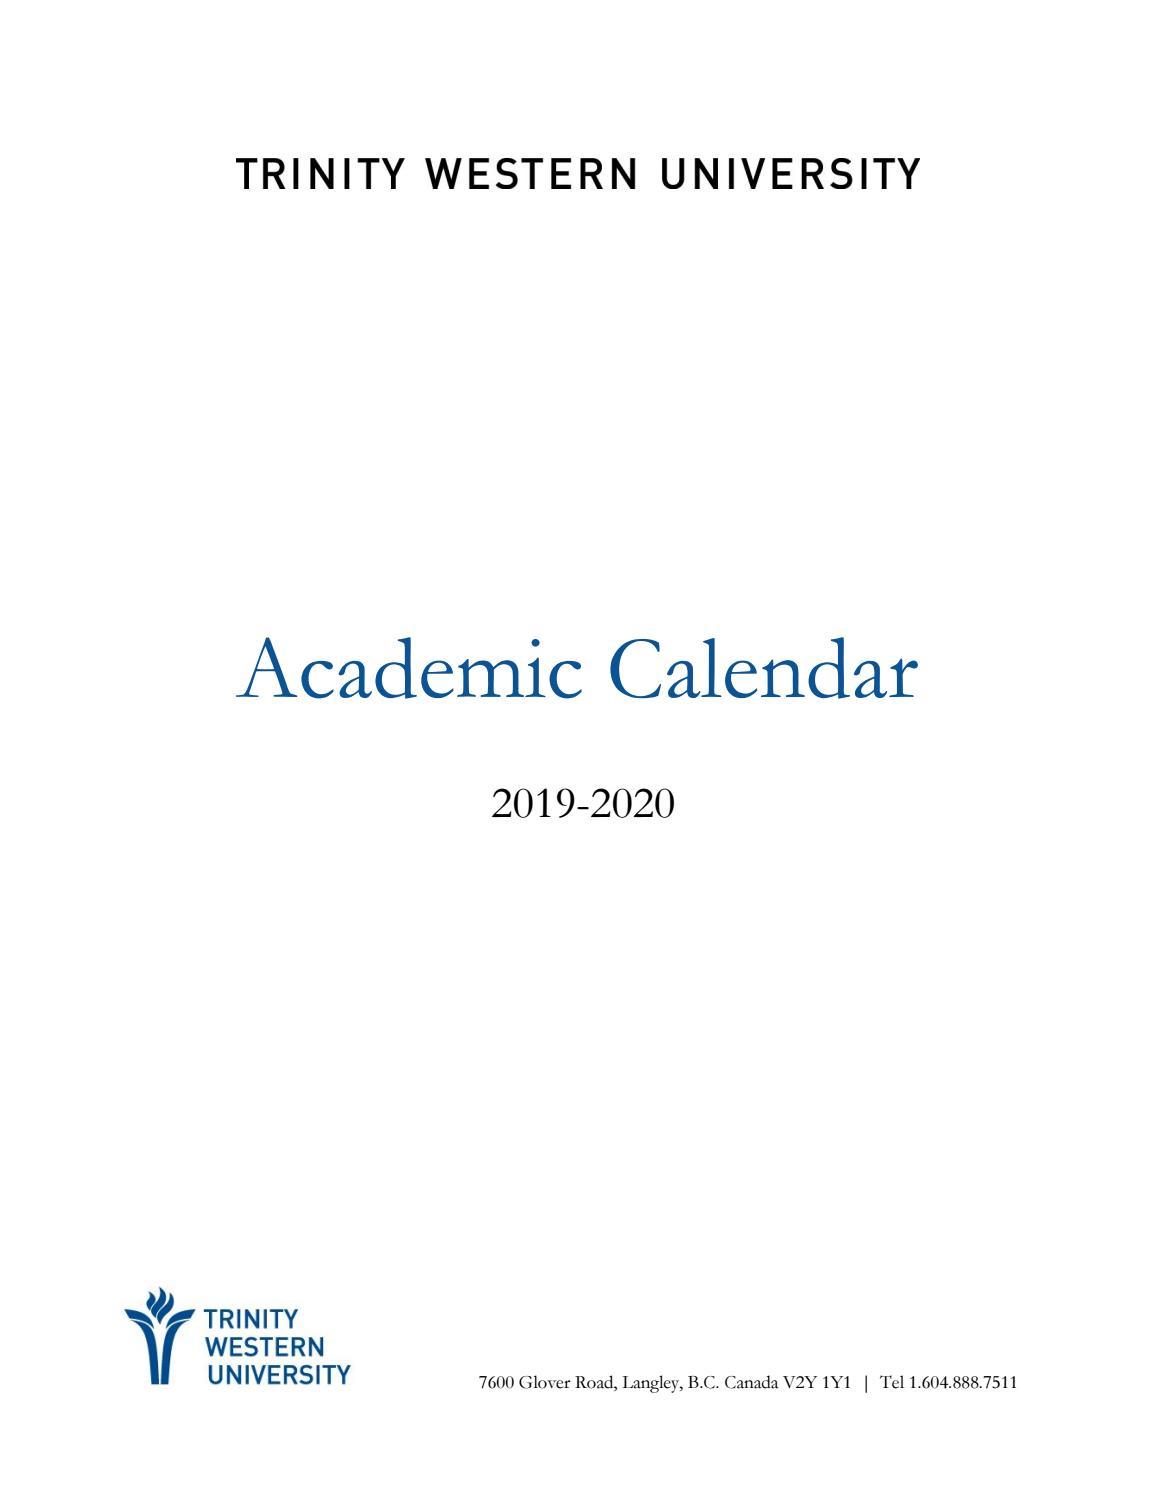 2019 20 Academic Calendartwu – Issuu Regarding Kent State University Academic Calendar 2021